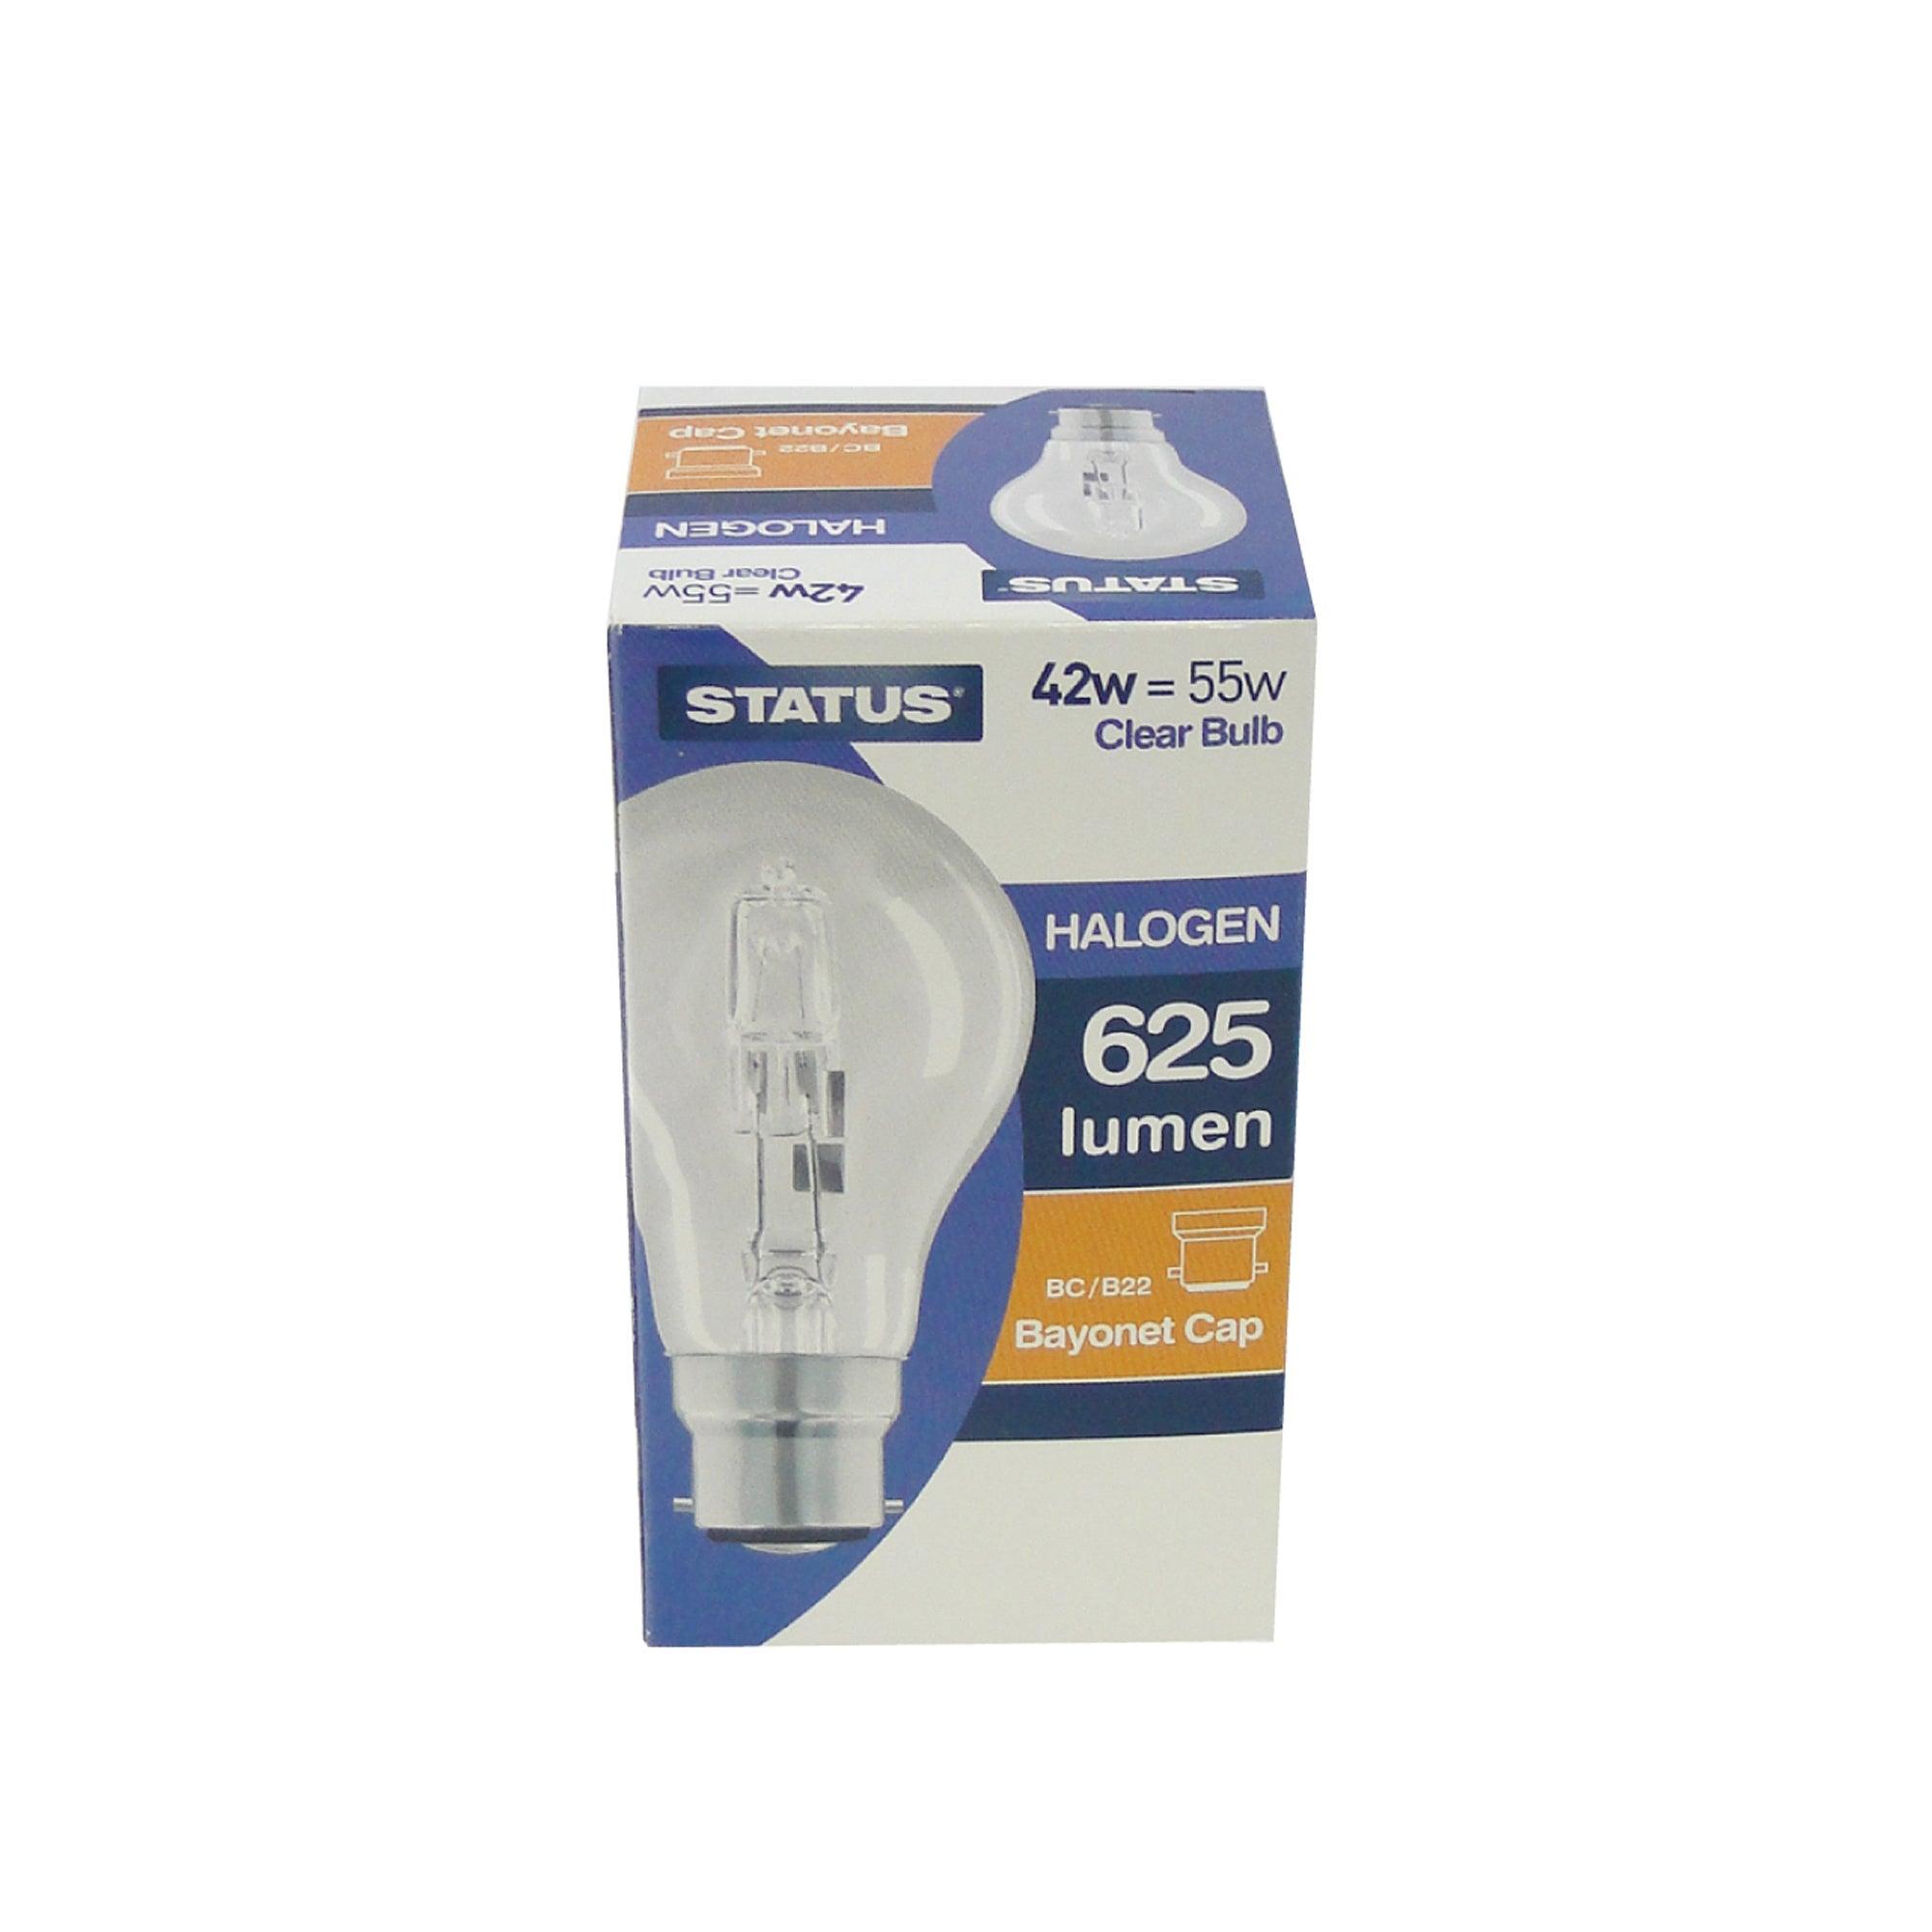 Status Halogen Energy Saver 42 Watt GLS Bulb